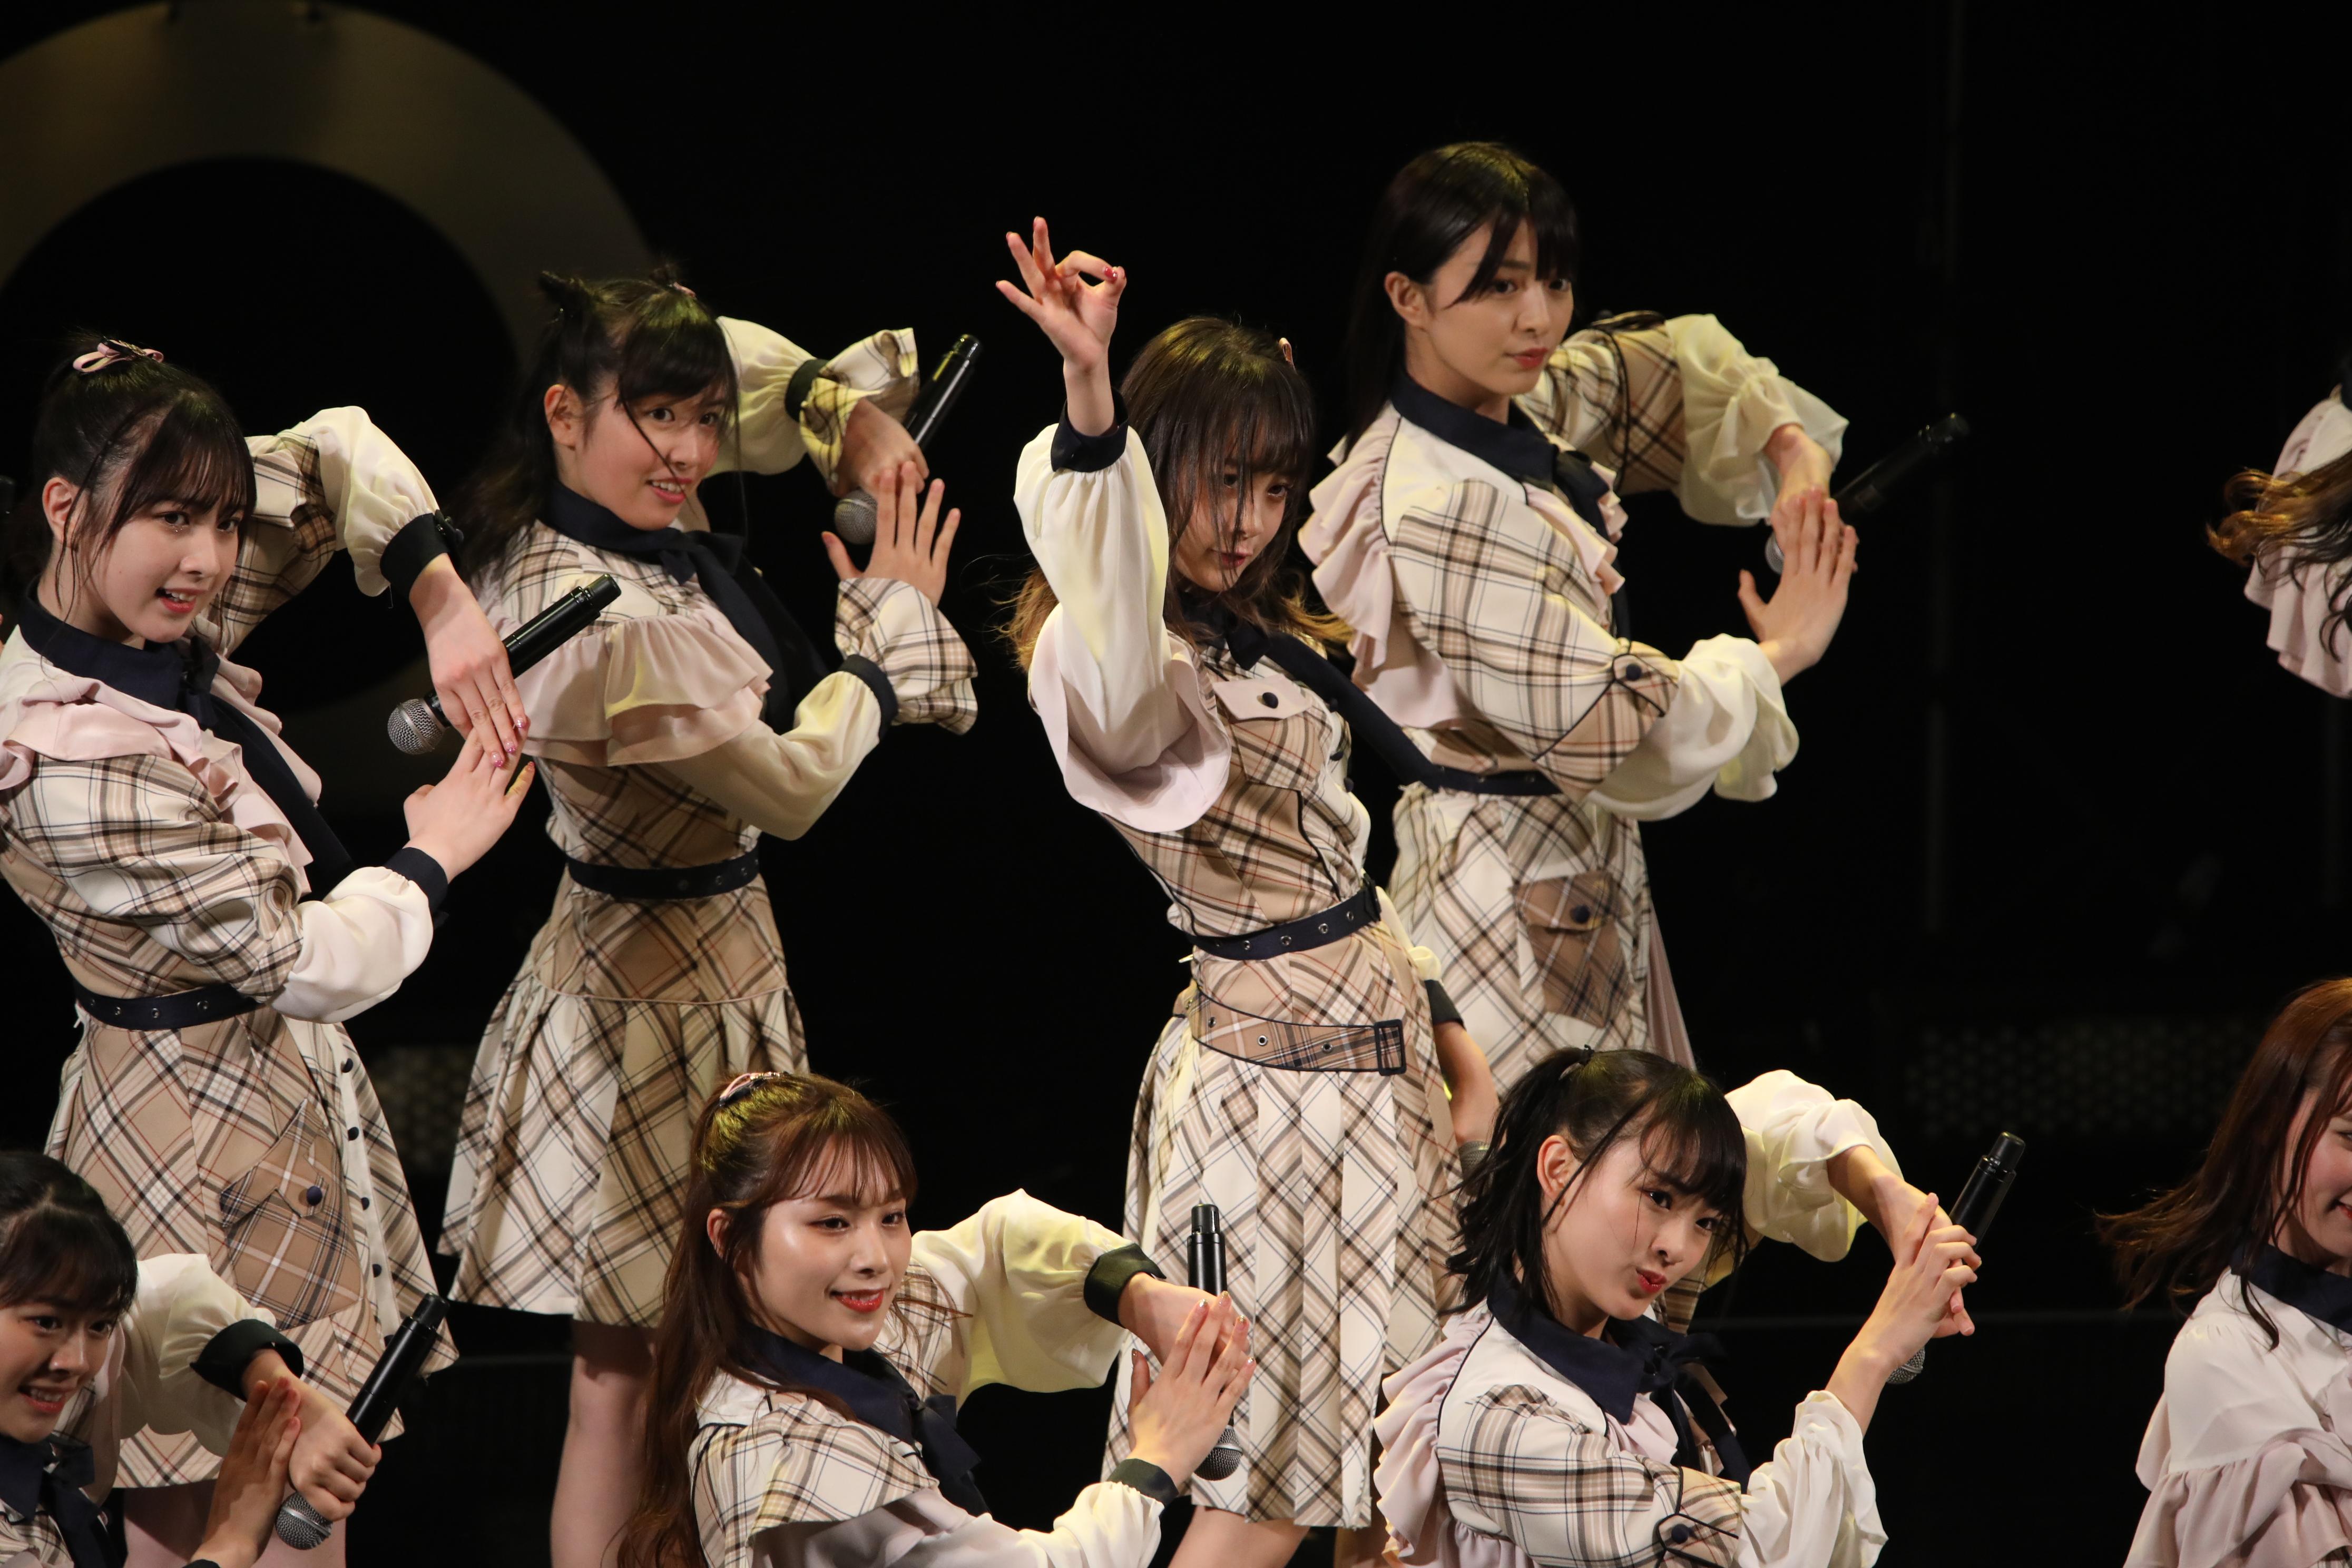 「@JAM 2019 Day2〜SUPER LIVE〜」で『蜂の巣ダンス』を披露するチーム8・横山結衣